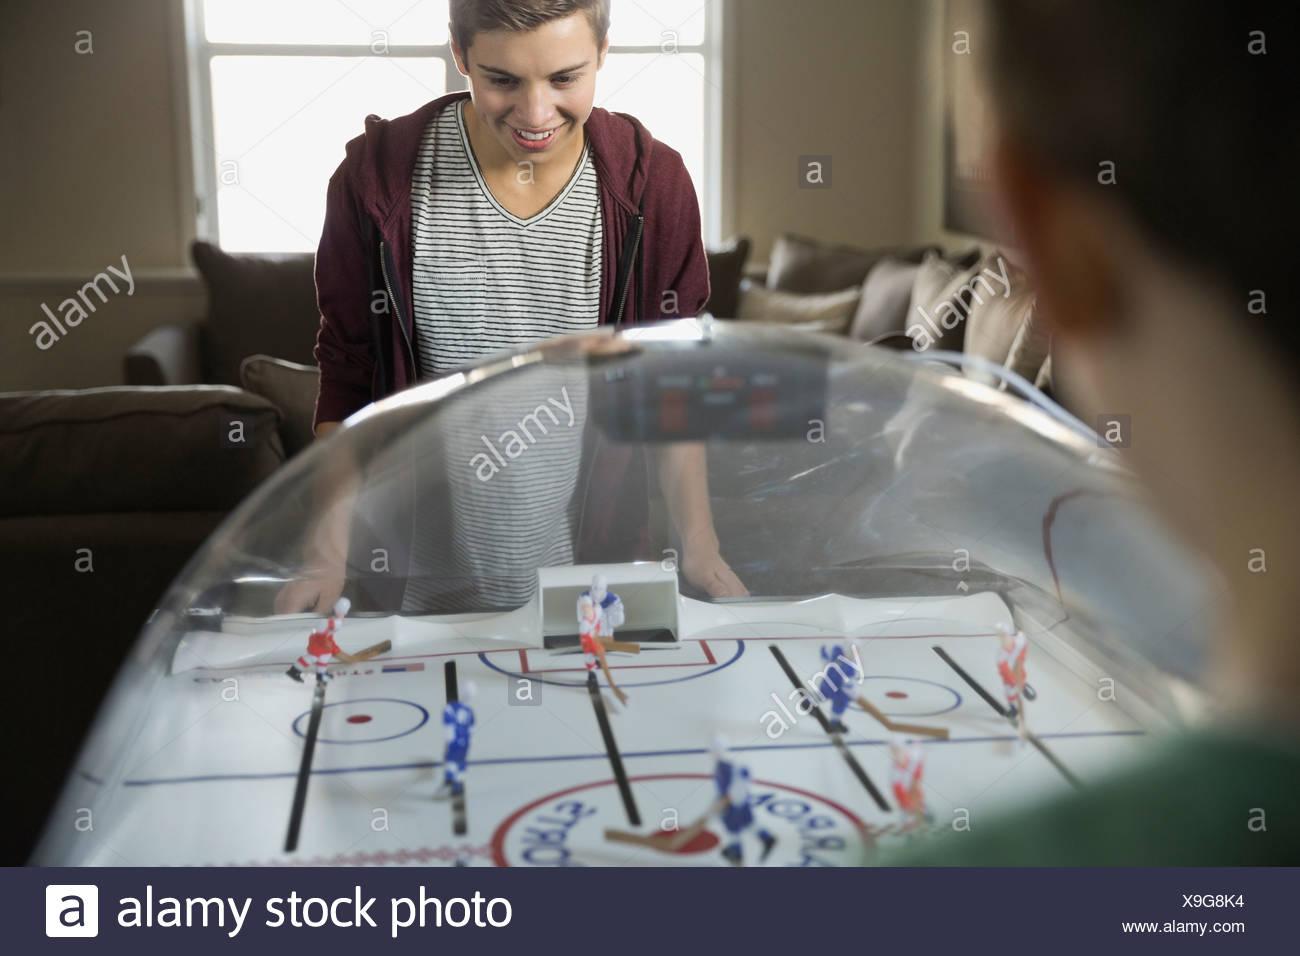 hockey games stockfotos hockey games bilder alamy. Black Bedroom Furniture Sets. Home Design Ideas